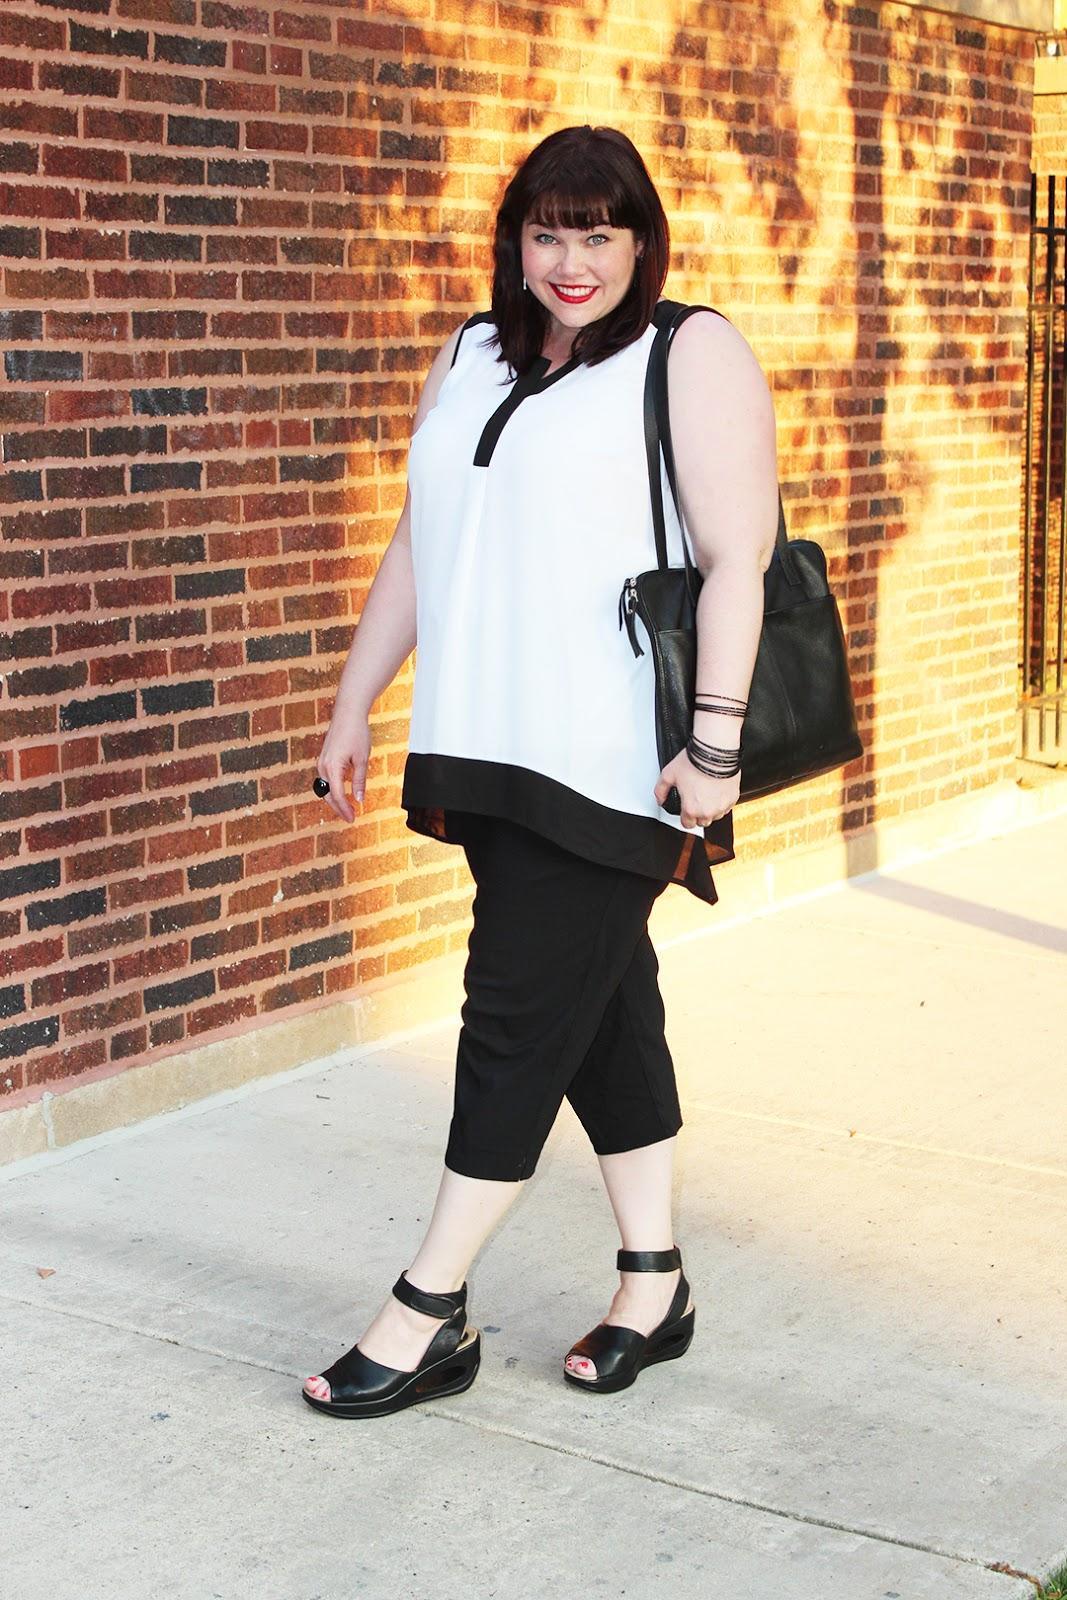 plus size blogger, plus size model, Amber Style Plus Curves, Black and White, Travel Outfit, plus size fashion, plus size style